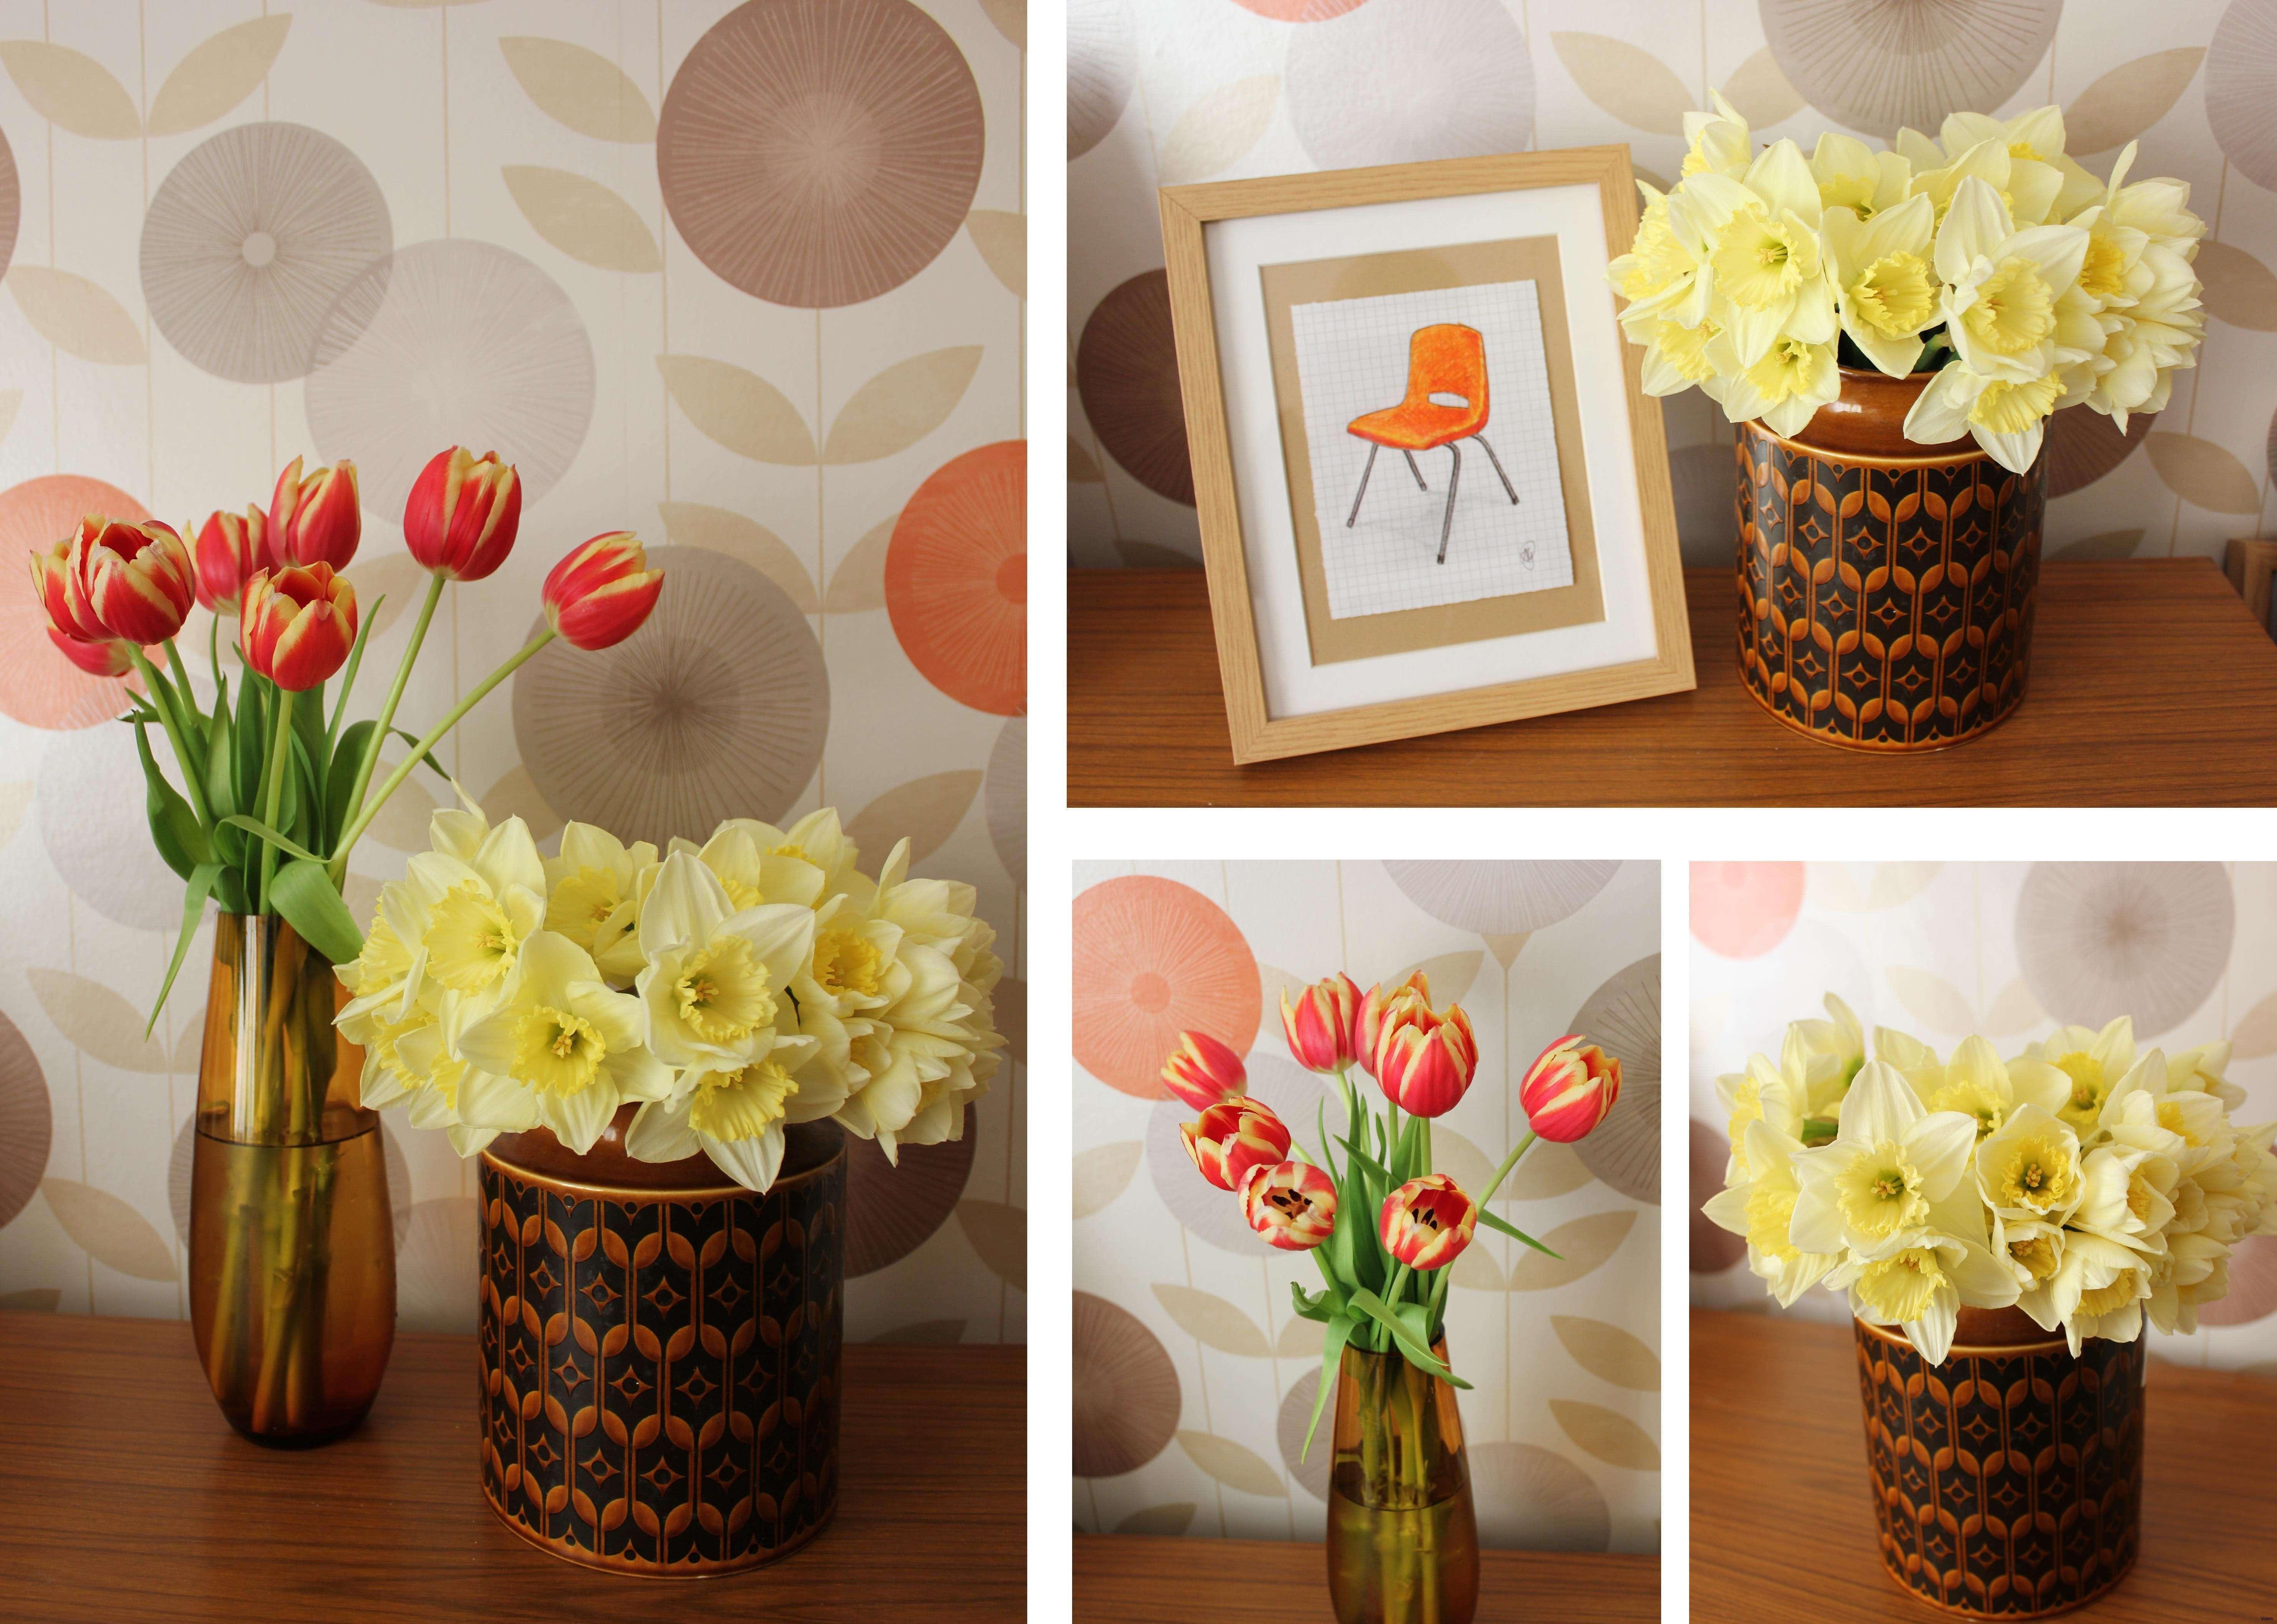 20 Amazing 3 Piece Vase Centerpiece Decorative Vase Ideas